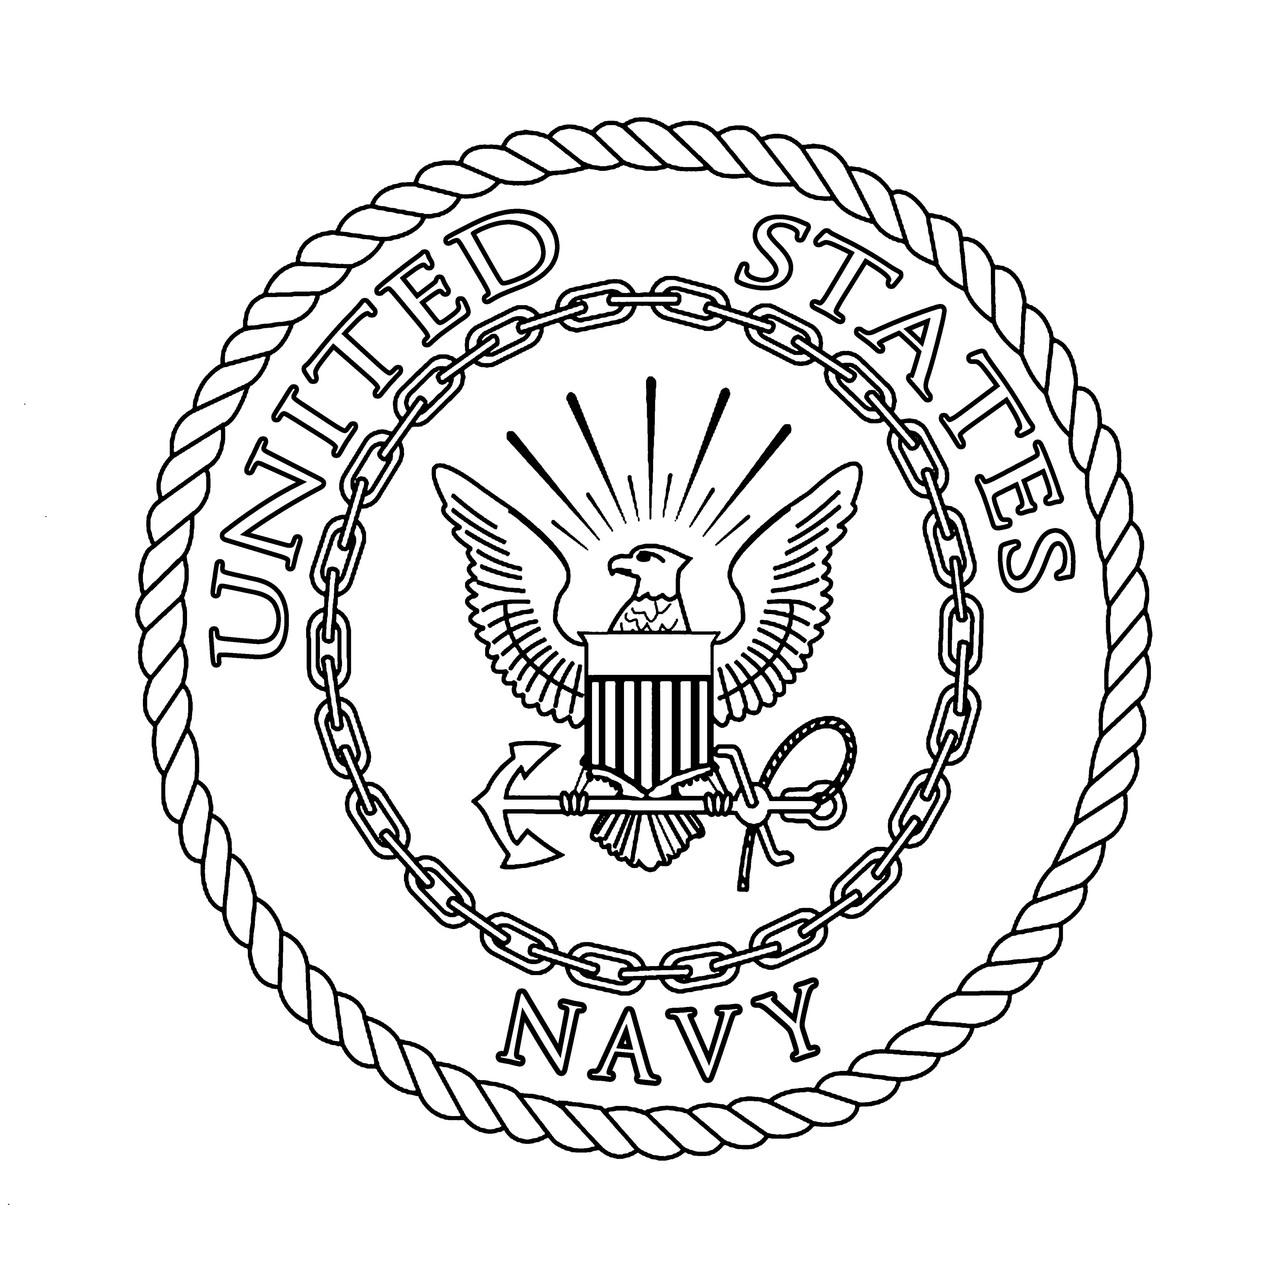 1280x1280 Navy Preprinted Wholecloth 12 [White]